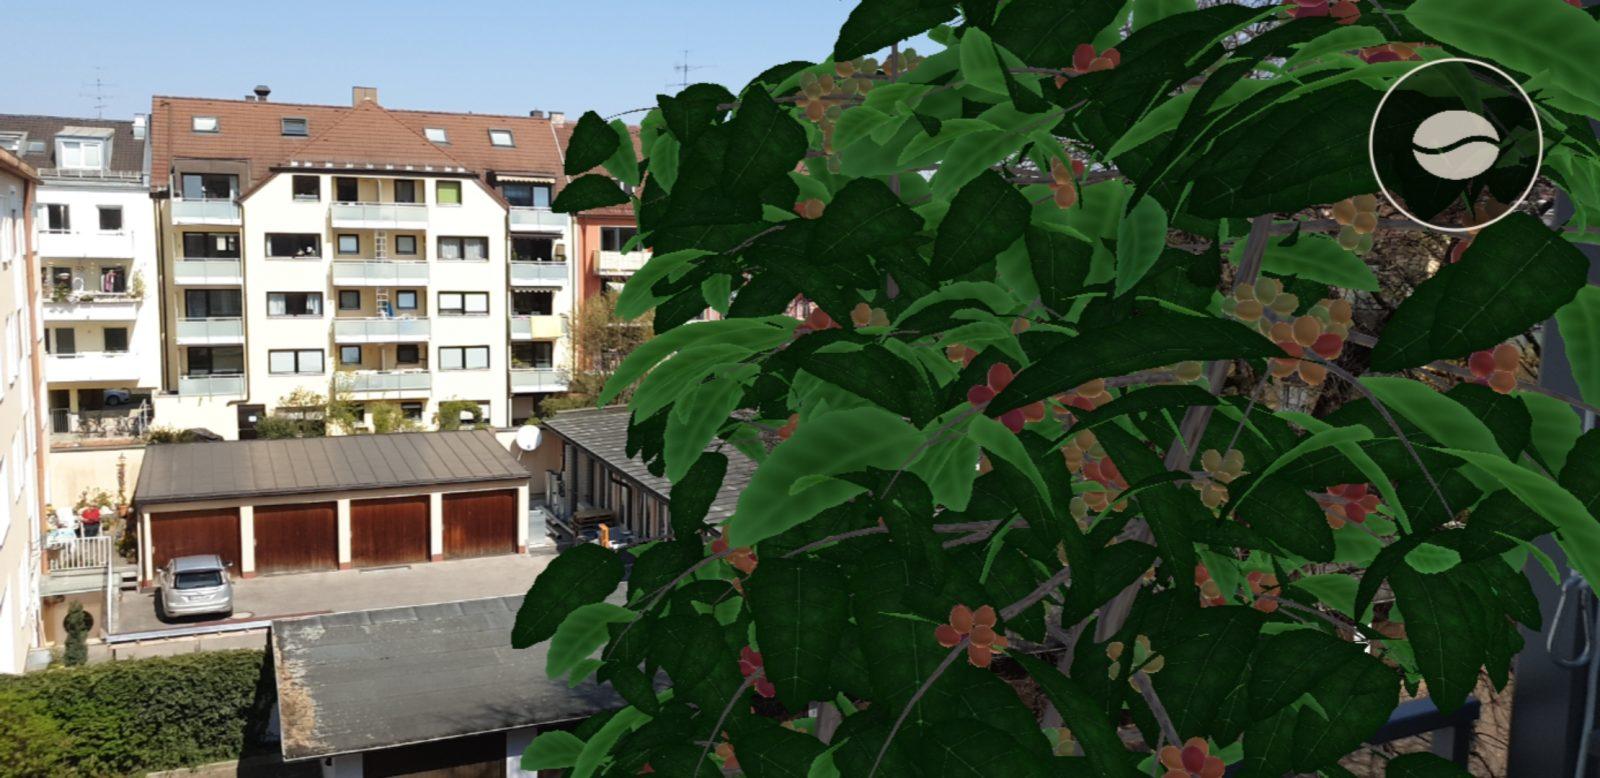 AR-App mit virtueller Kaffeepflanze für daheim